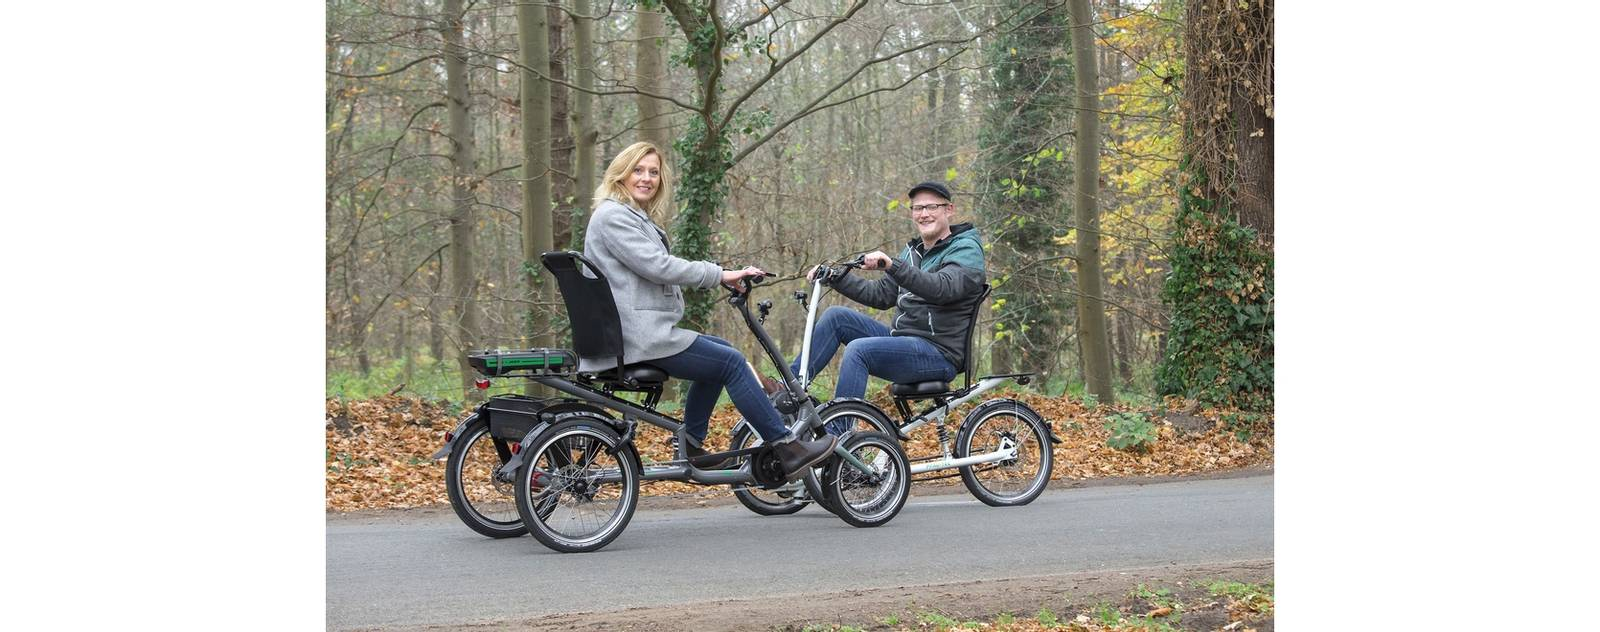 trehjul tohjul elsykkel Pfiff spesialsykkel Scoobo Bosch 500 wh batteri